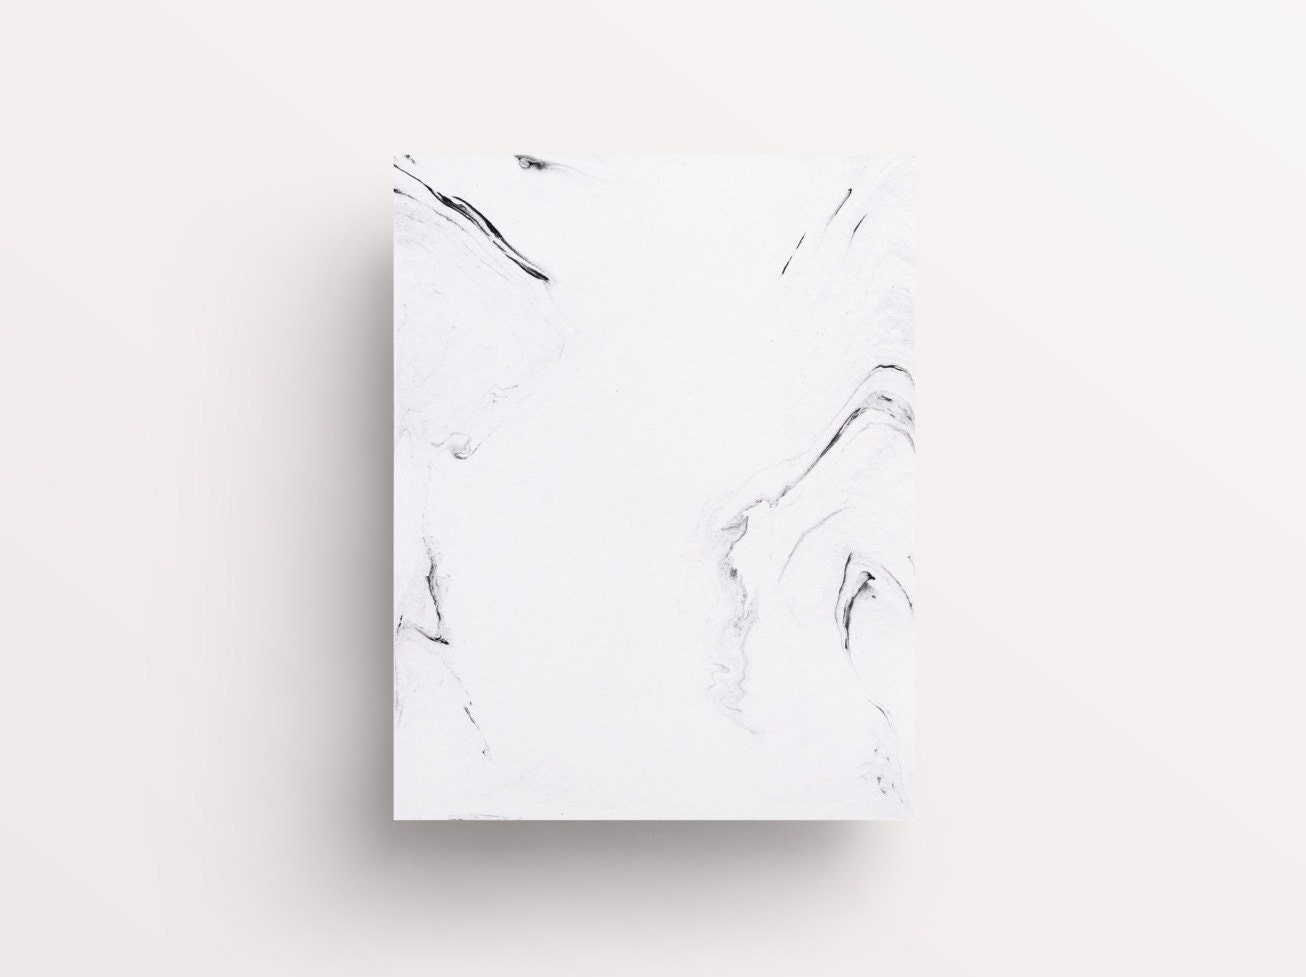 Wonderful Wallpaper Marble Print - il_fullxfull  You Should Have_474644.jpg?version\u003d2